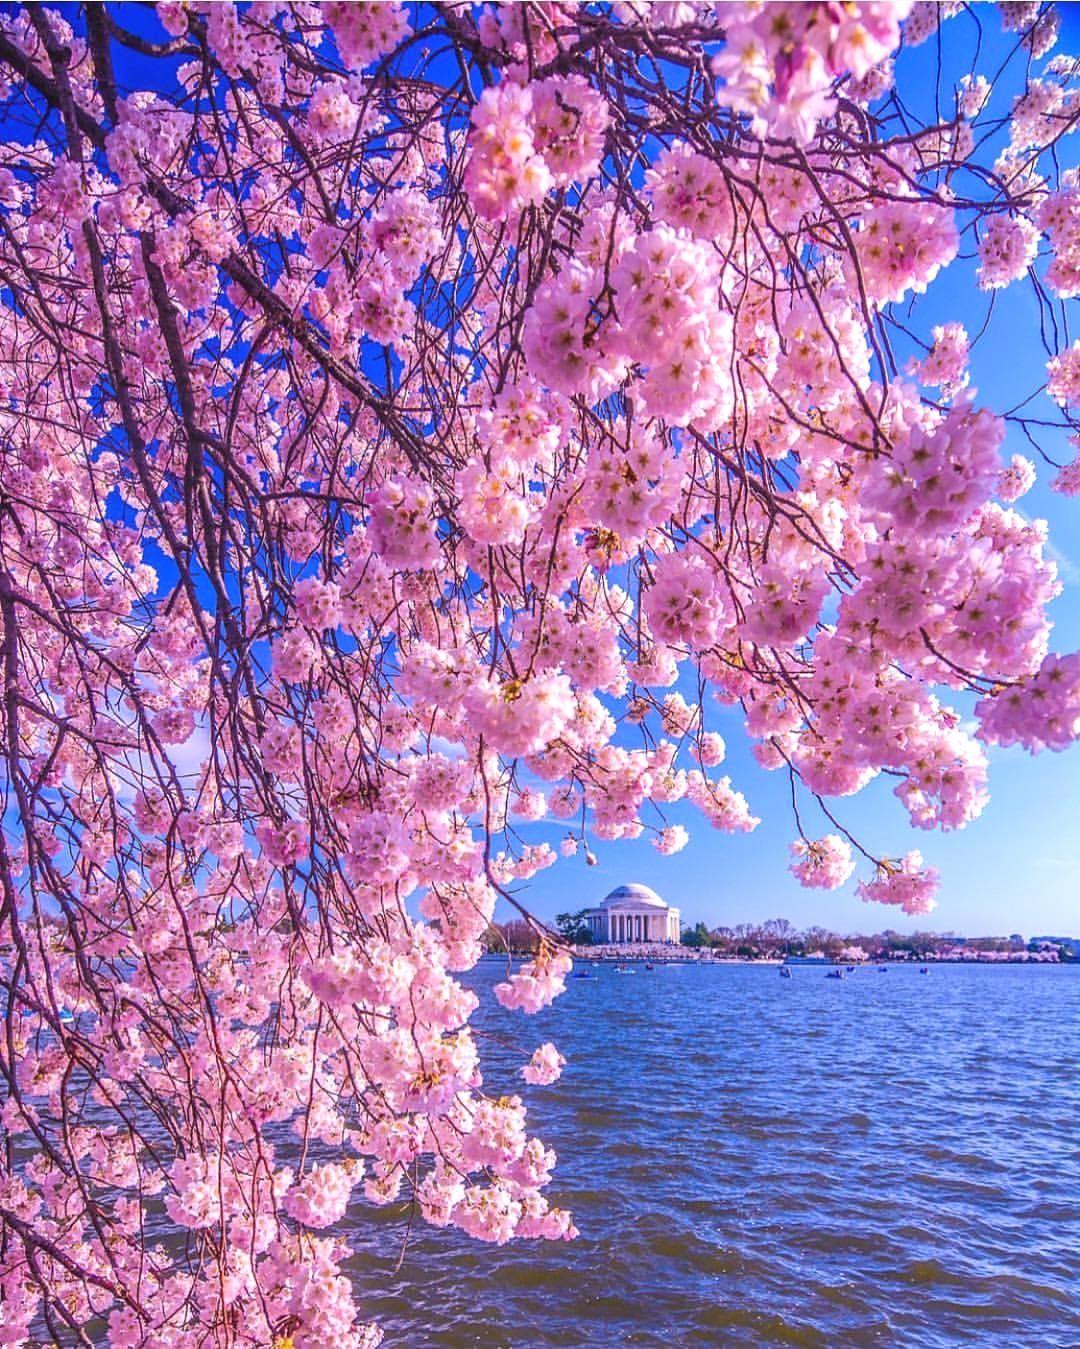 Cherry Blossom Washington D C Pic Cbezerraphotos Cherry Blossom Background Background Pictures Photo